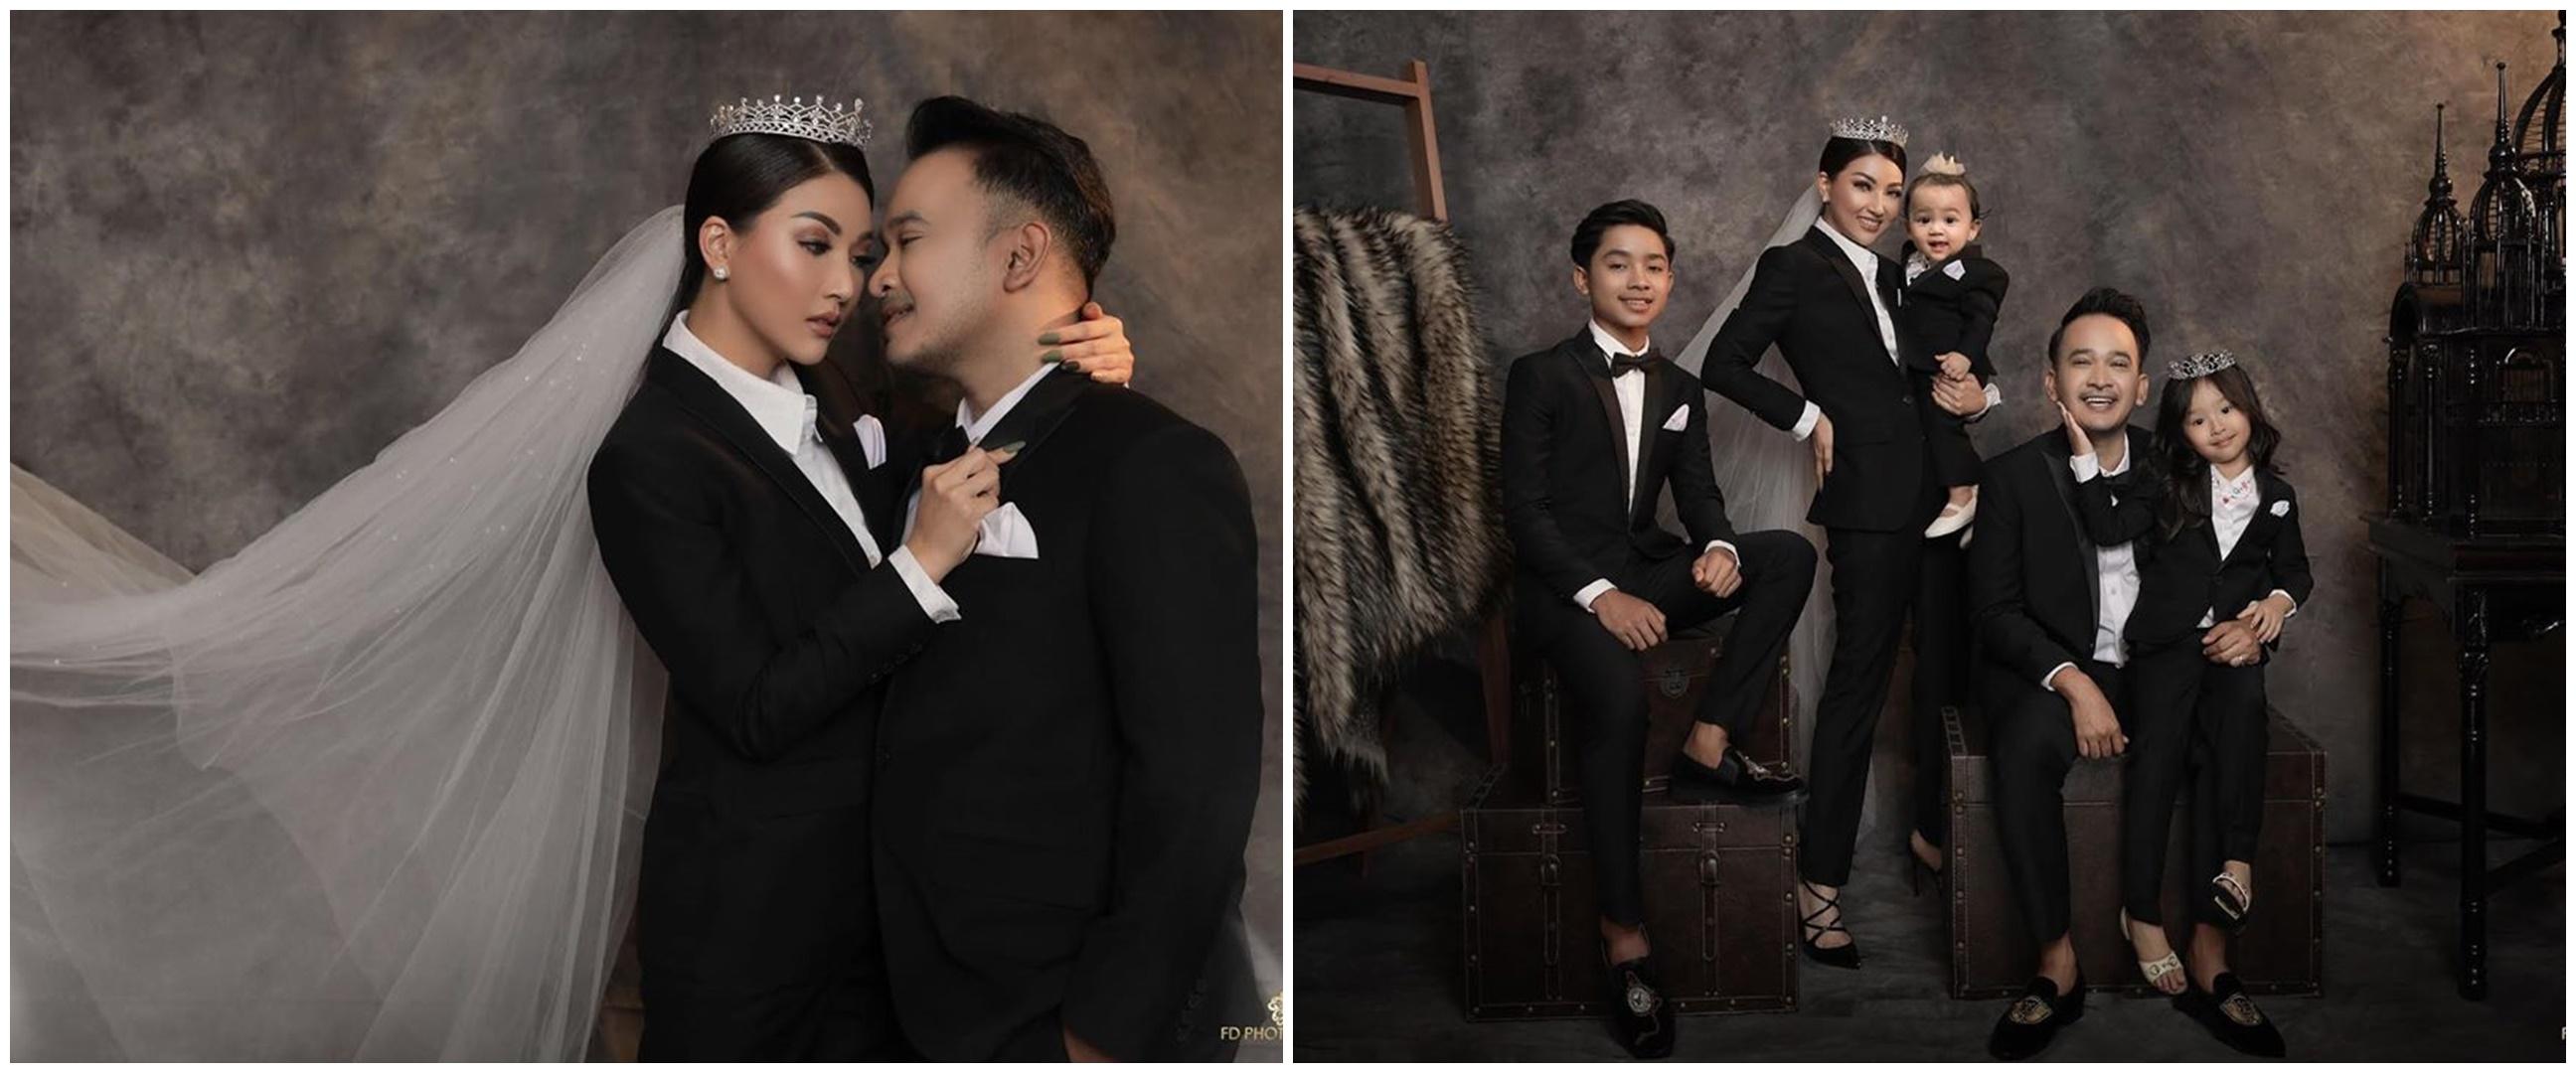 10 Gaya keluarga Ruben Onsu pemotretan tema hitam, simple tapi elegan